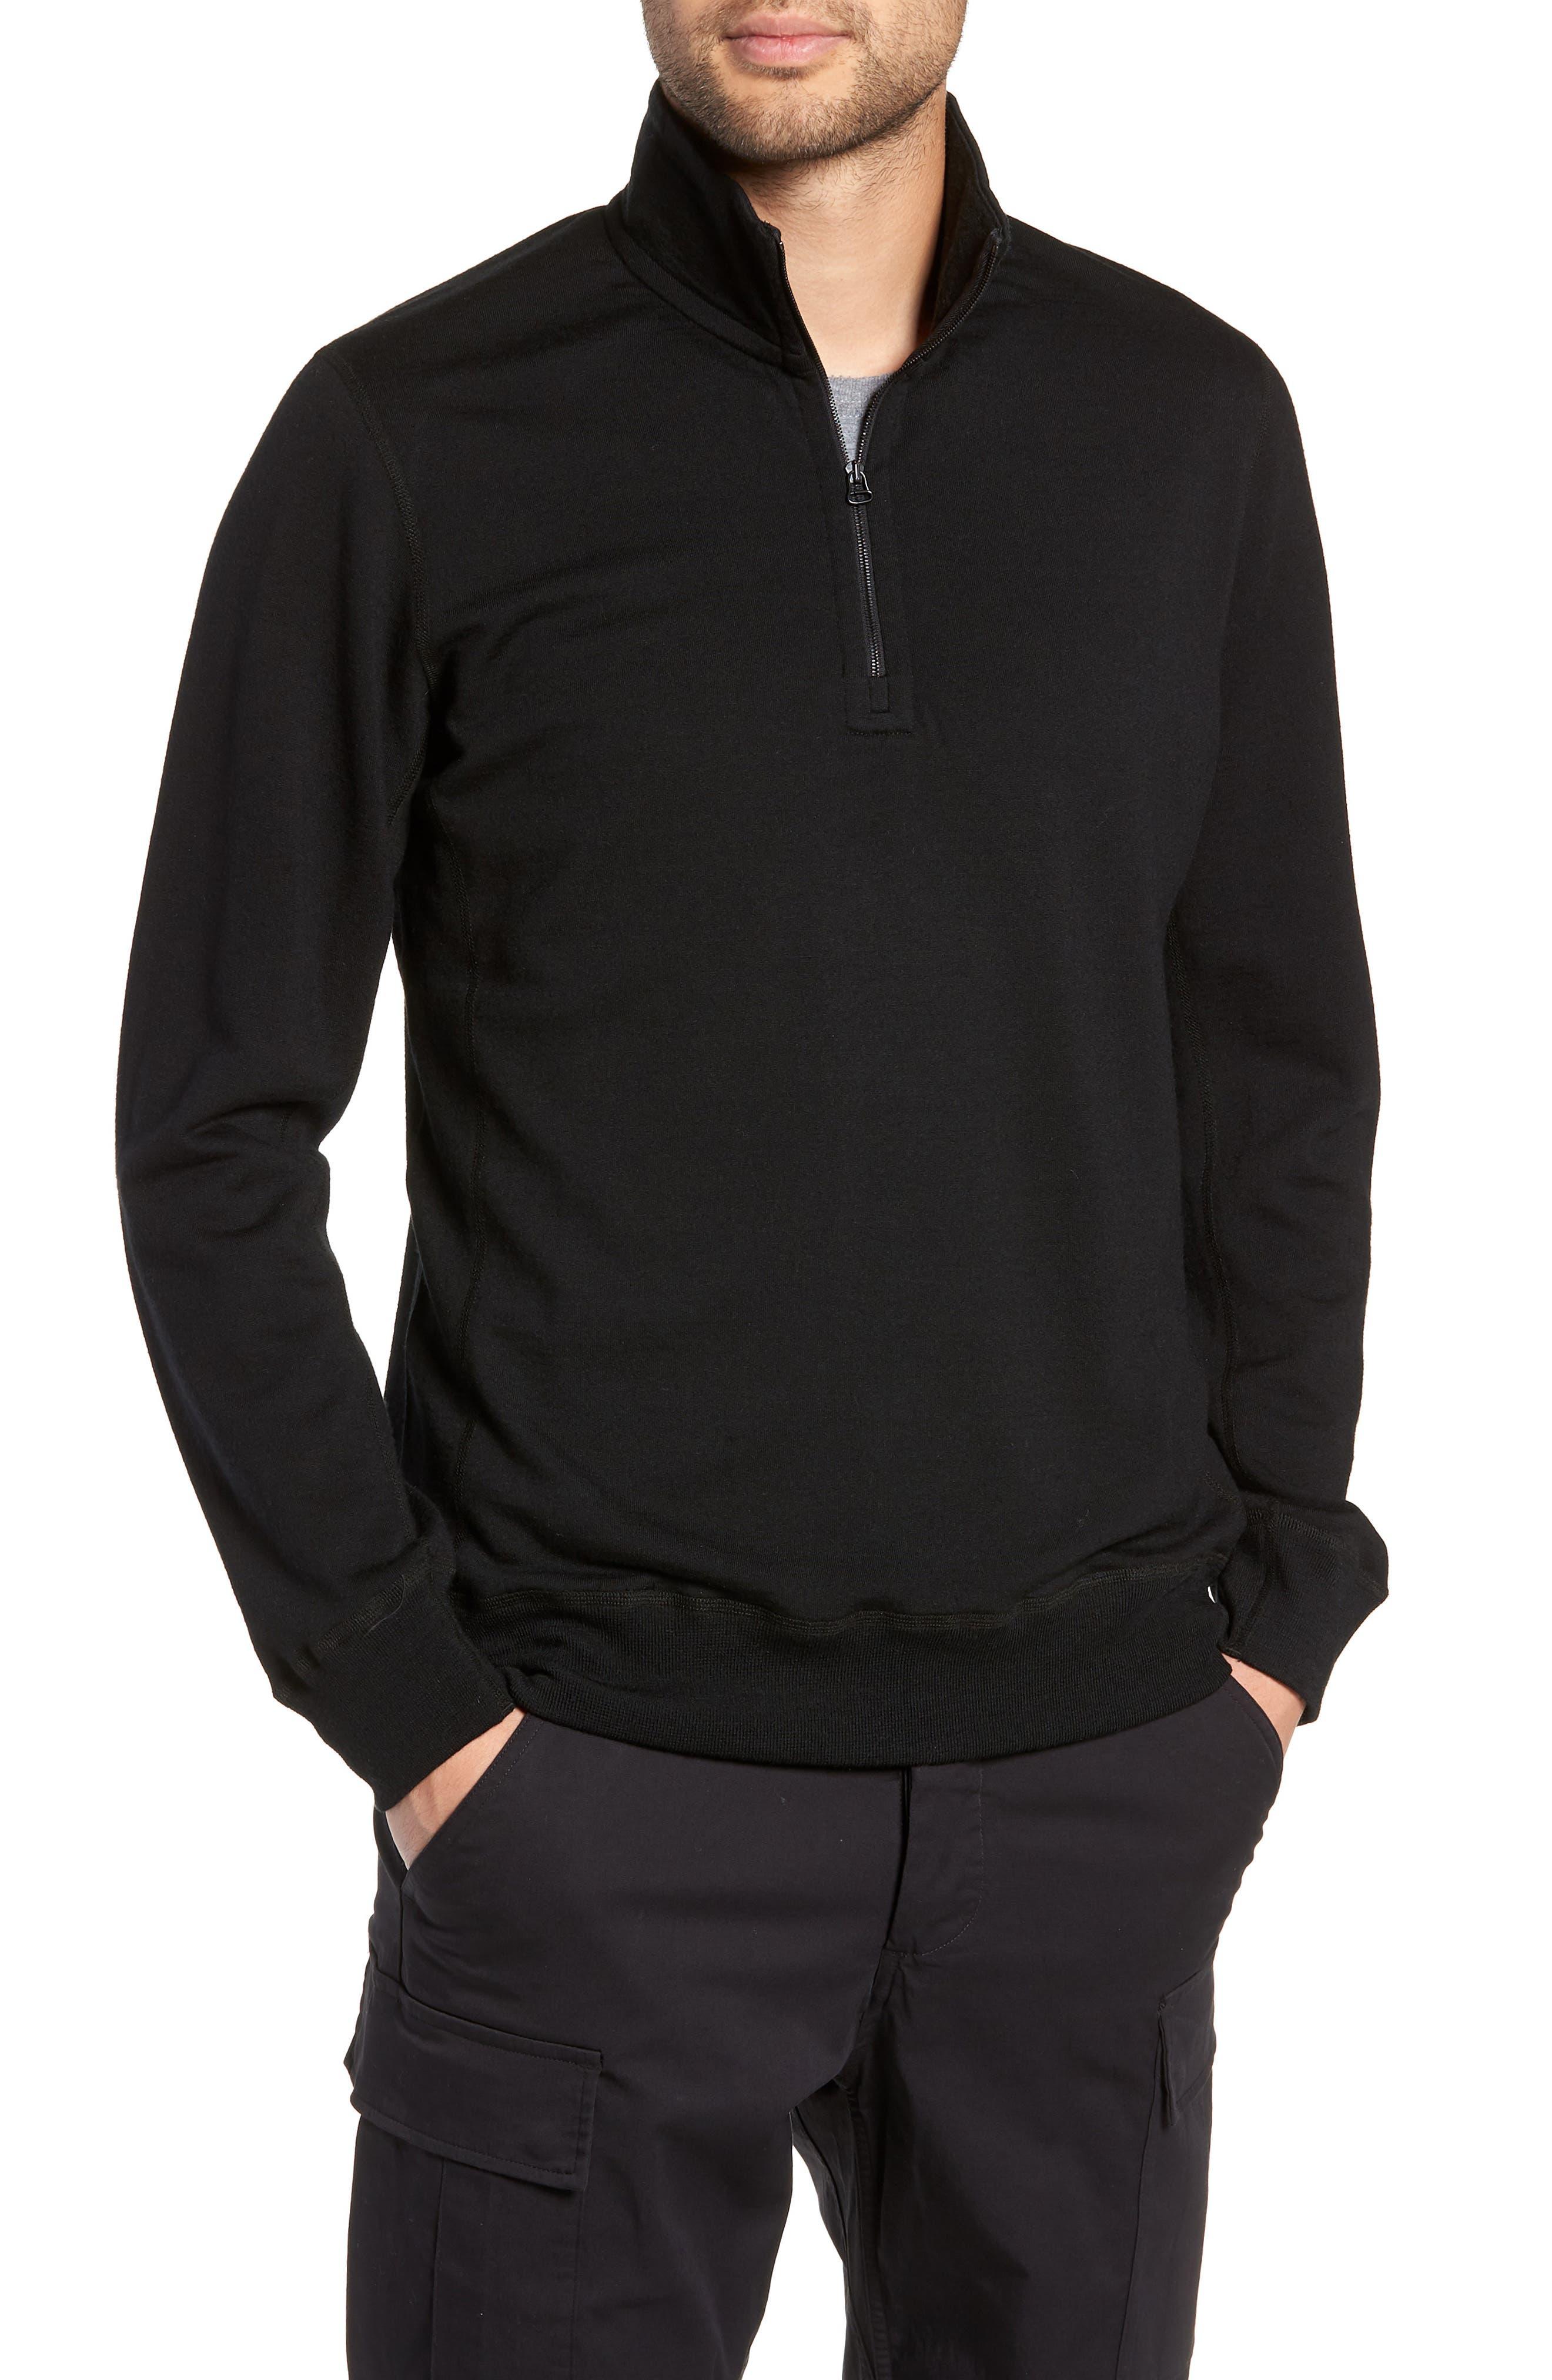 Swedish Merino Wool Trail Shirt,                             Main thumbnail 1, color,                             BLACK